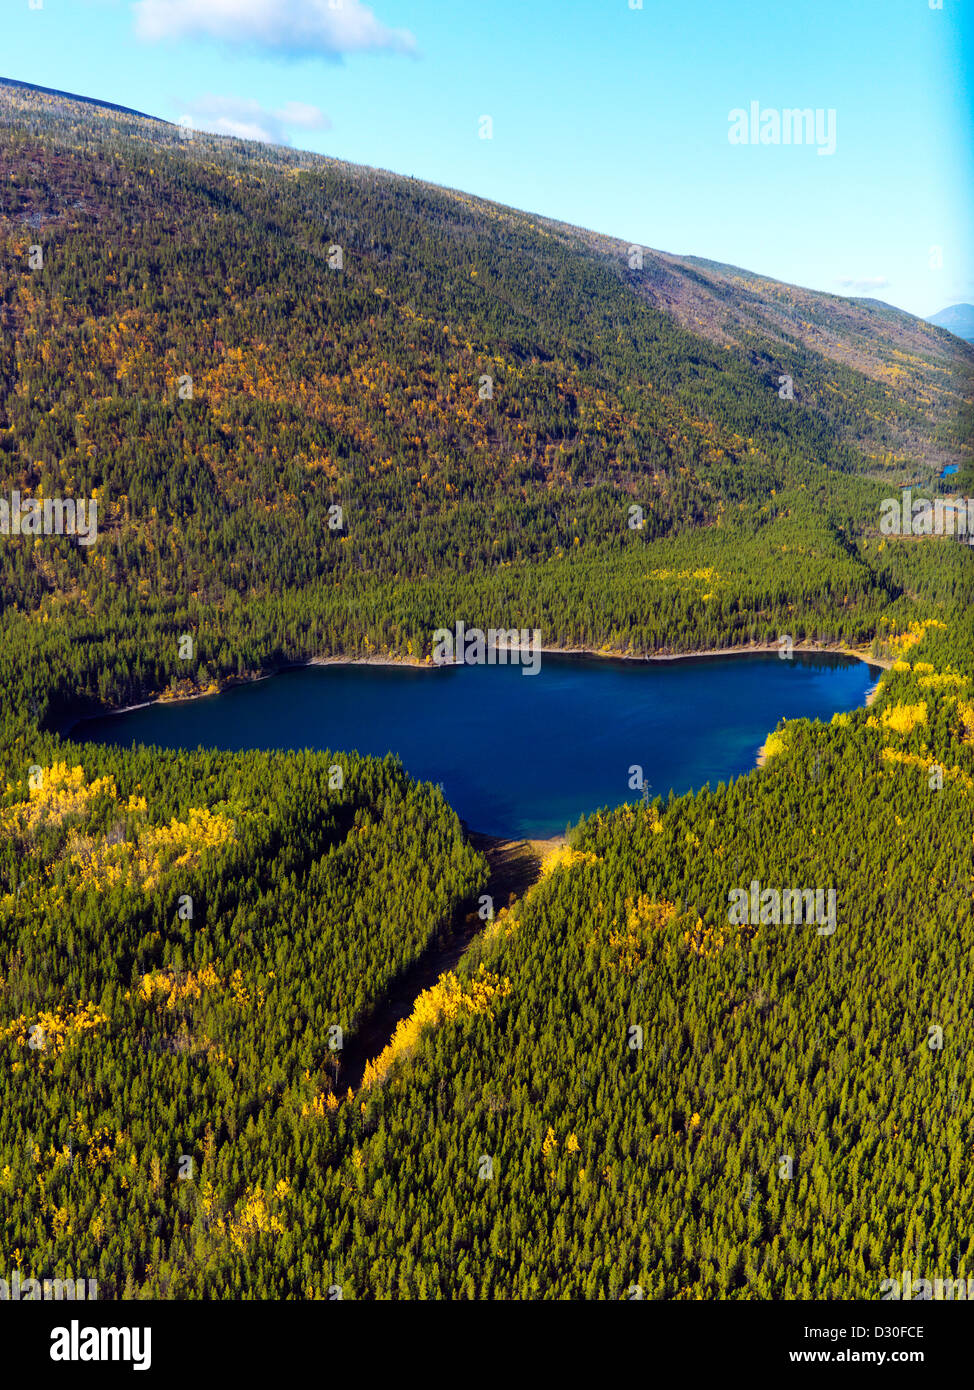 Fall colors in the Yukon Territory in Canada. - Stock Image